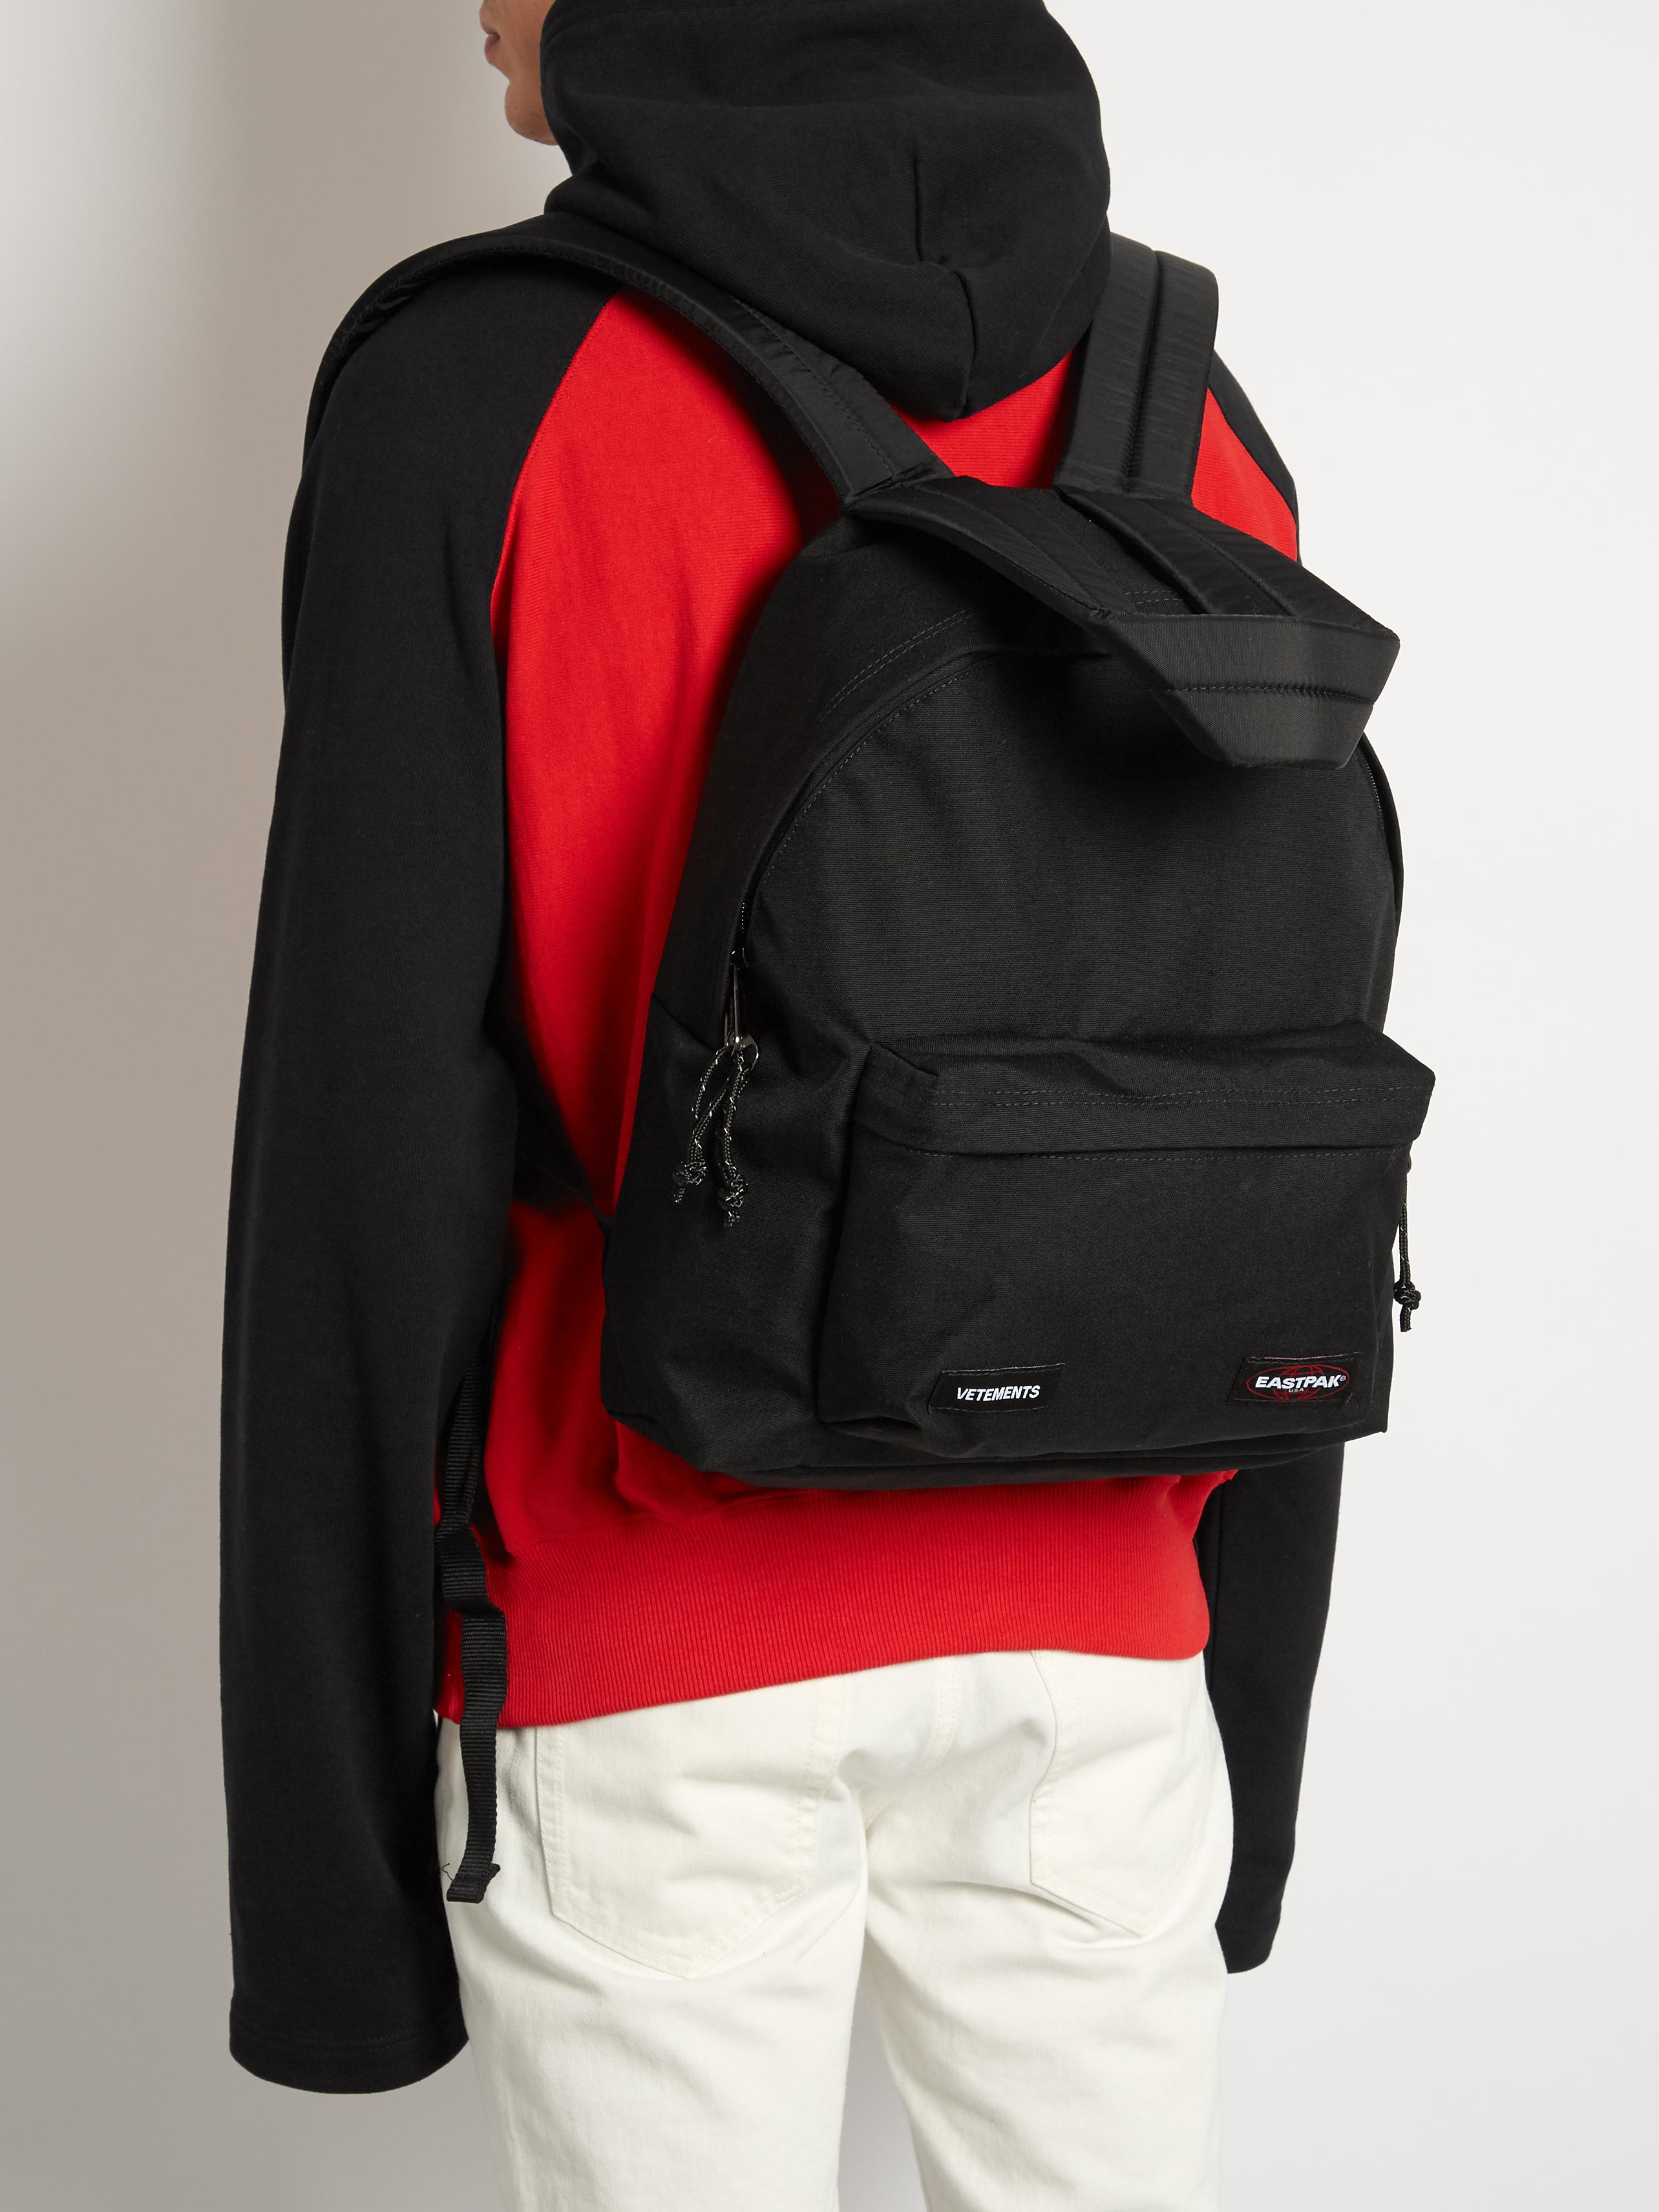 Vetements X Eastpak Canvas Backpack in Black